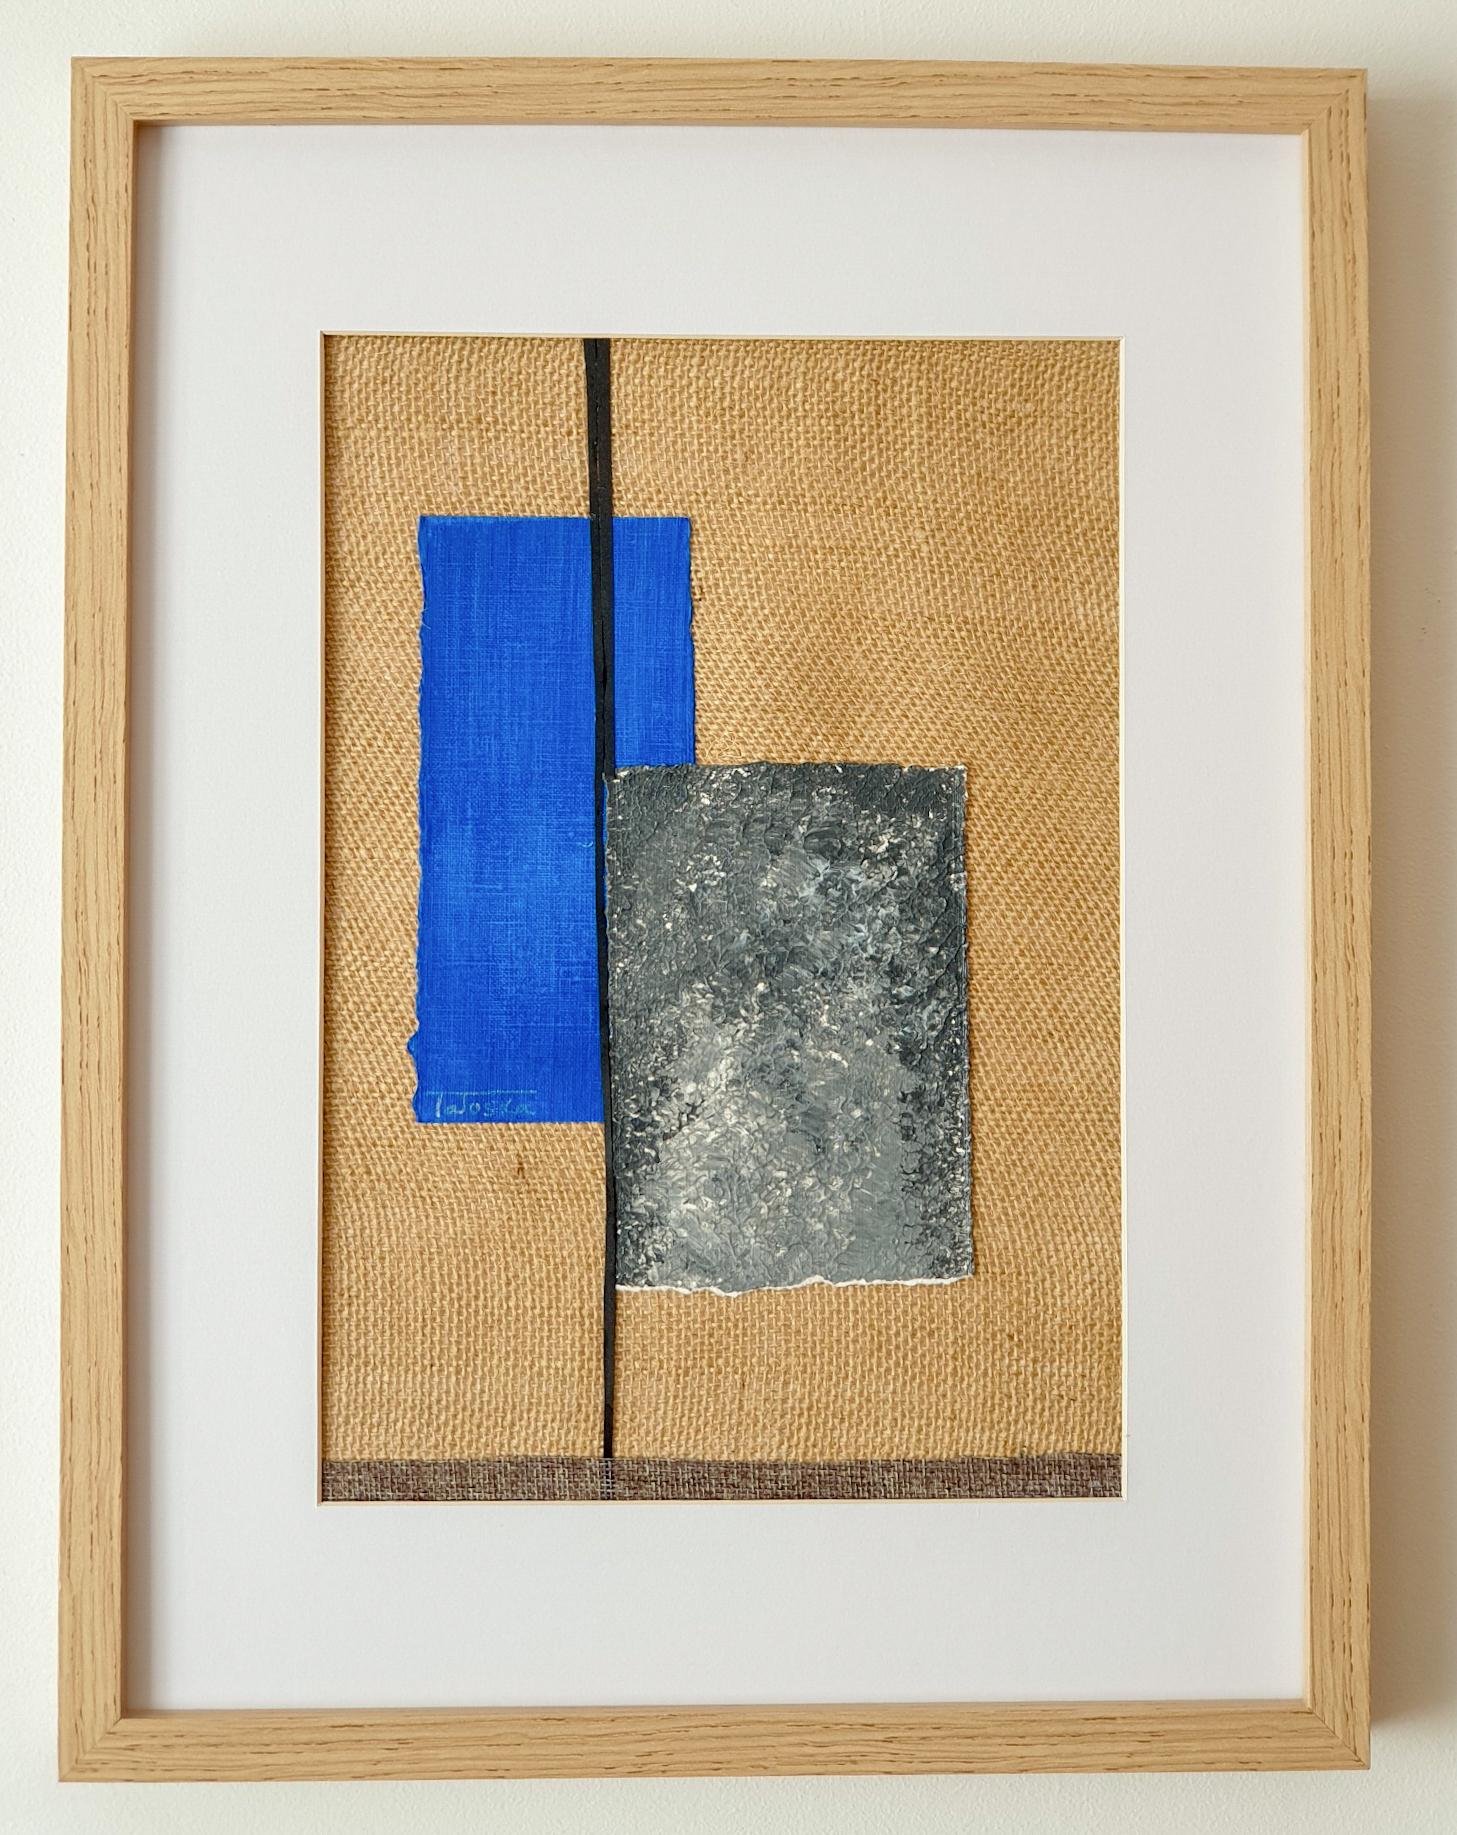 "Cuadro de arte abstracto titulado ""The moon"" de la artista Tatuska (https://artuska.com)"